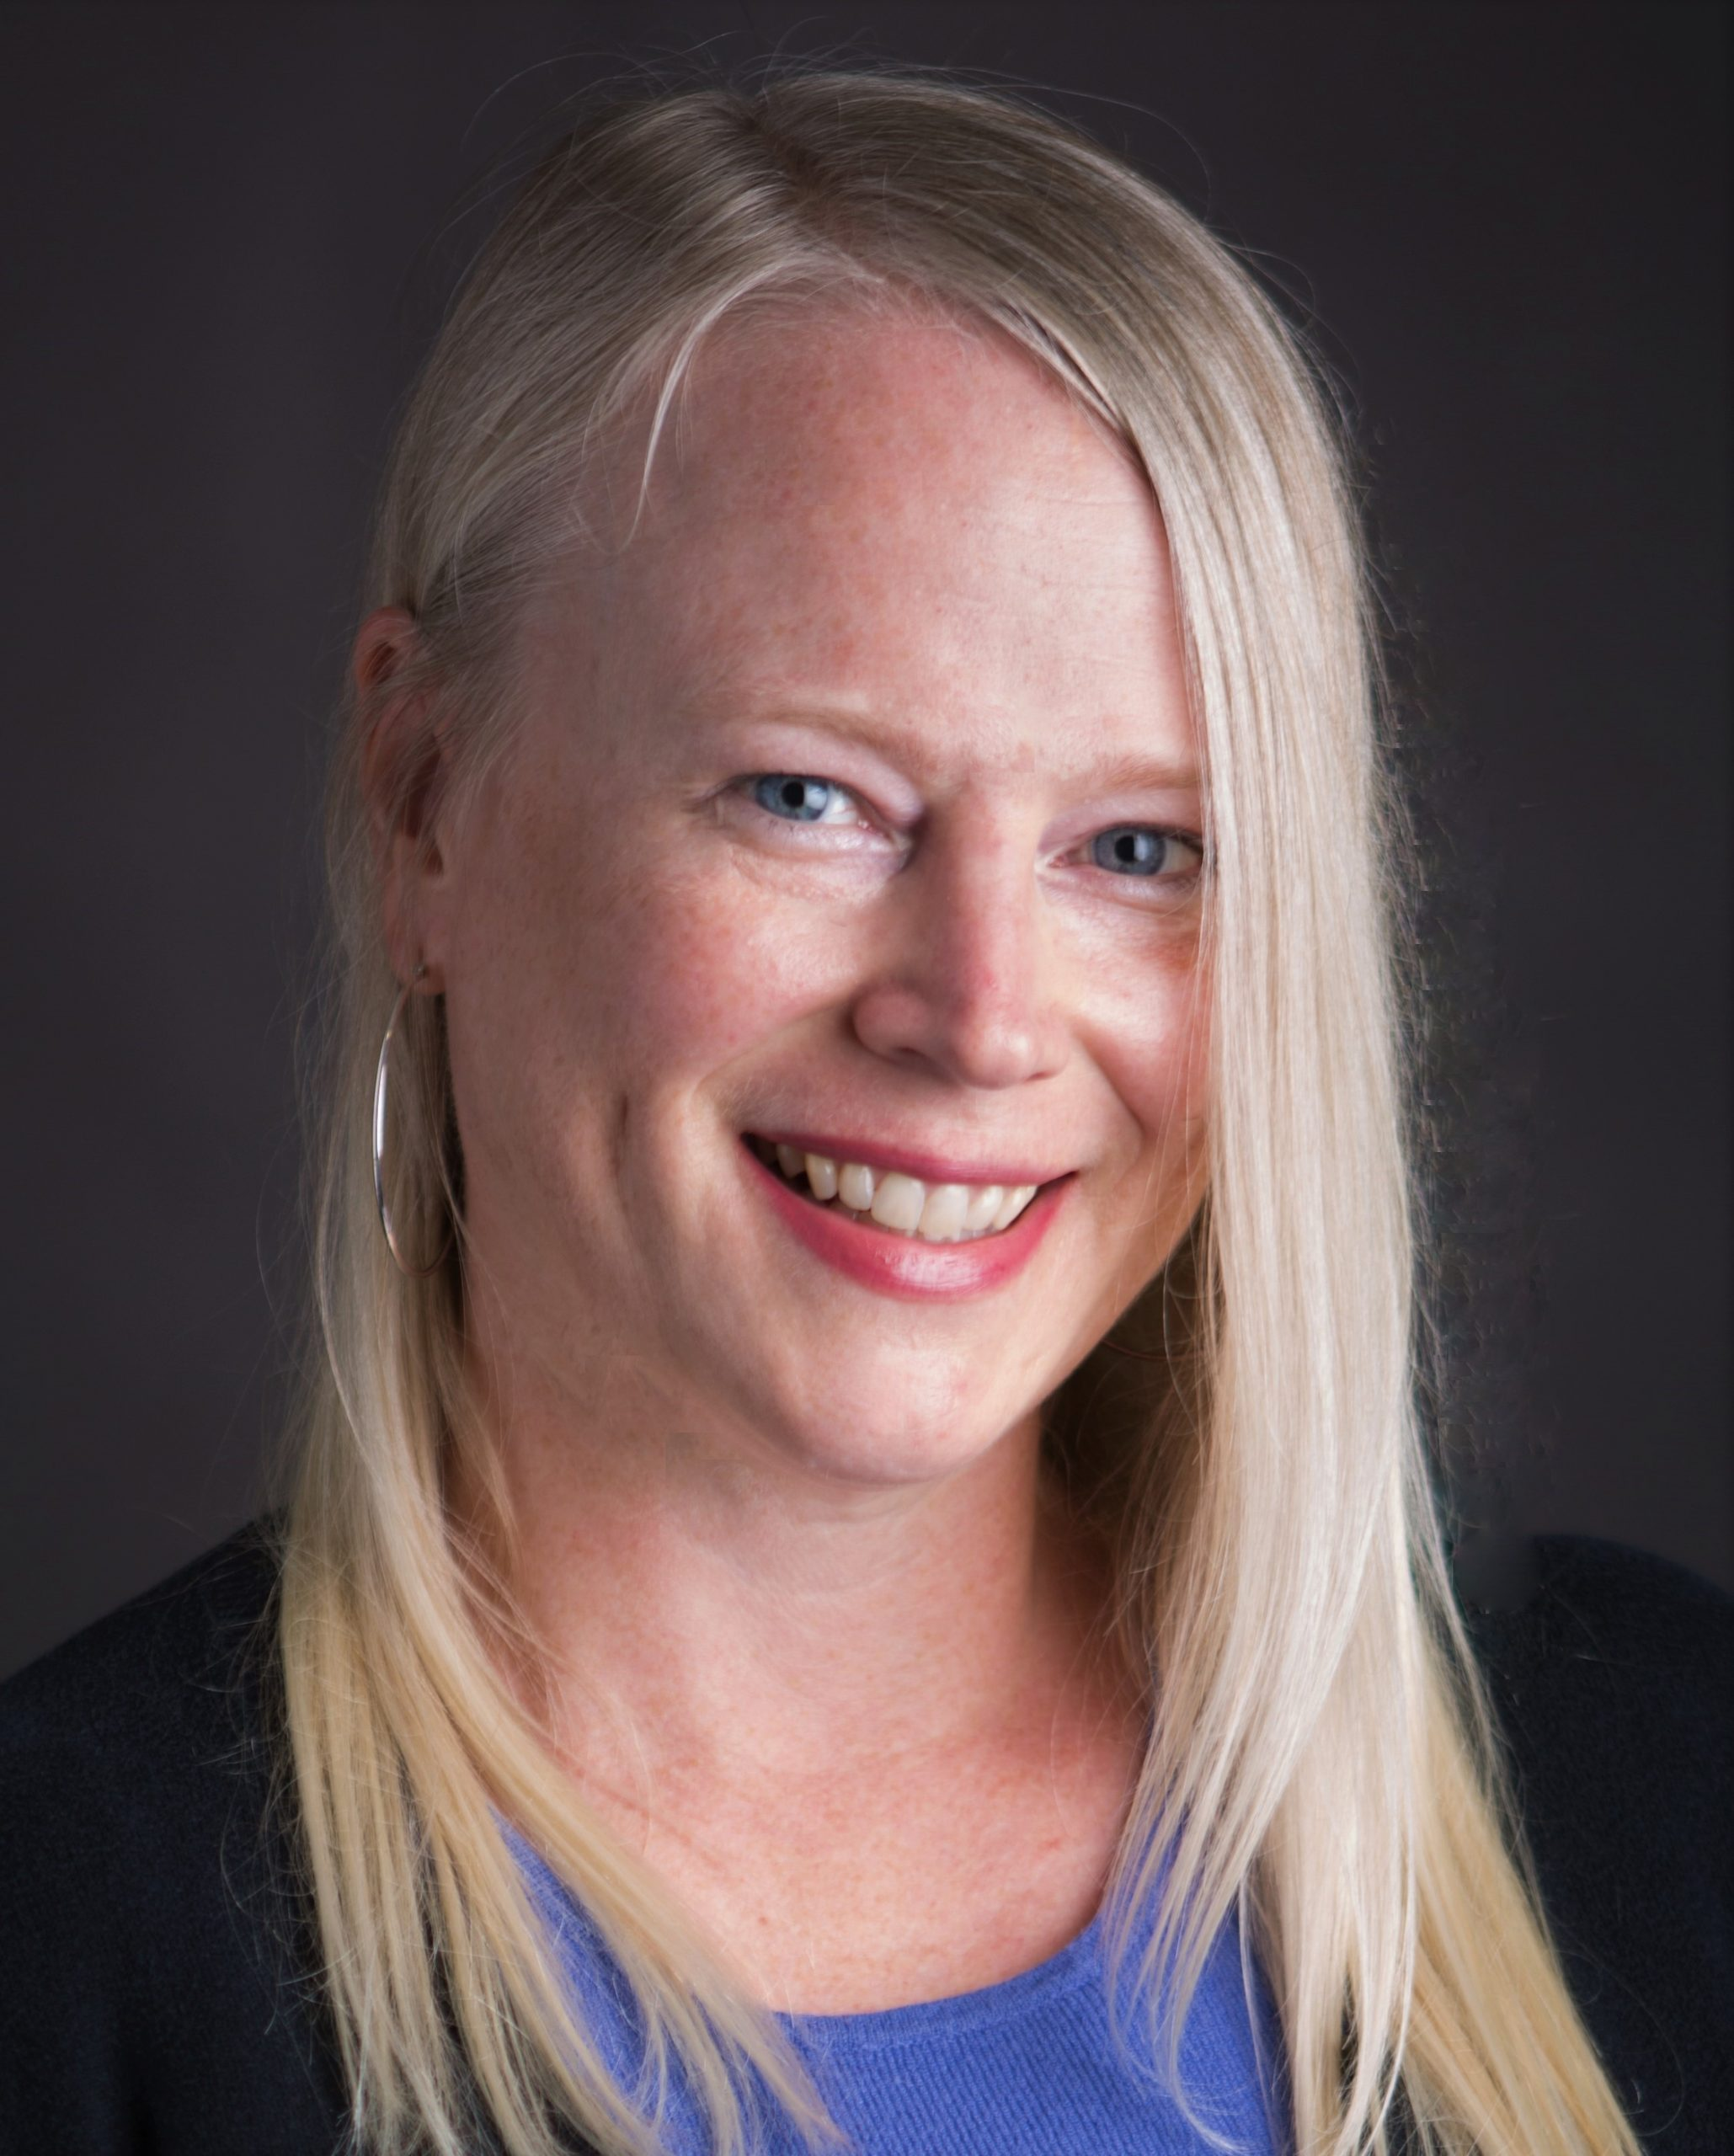 Elizabeth Sterbenz, M.A., LMFT